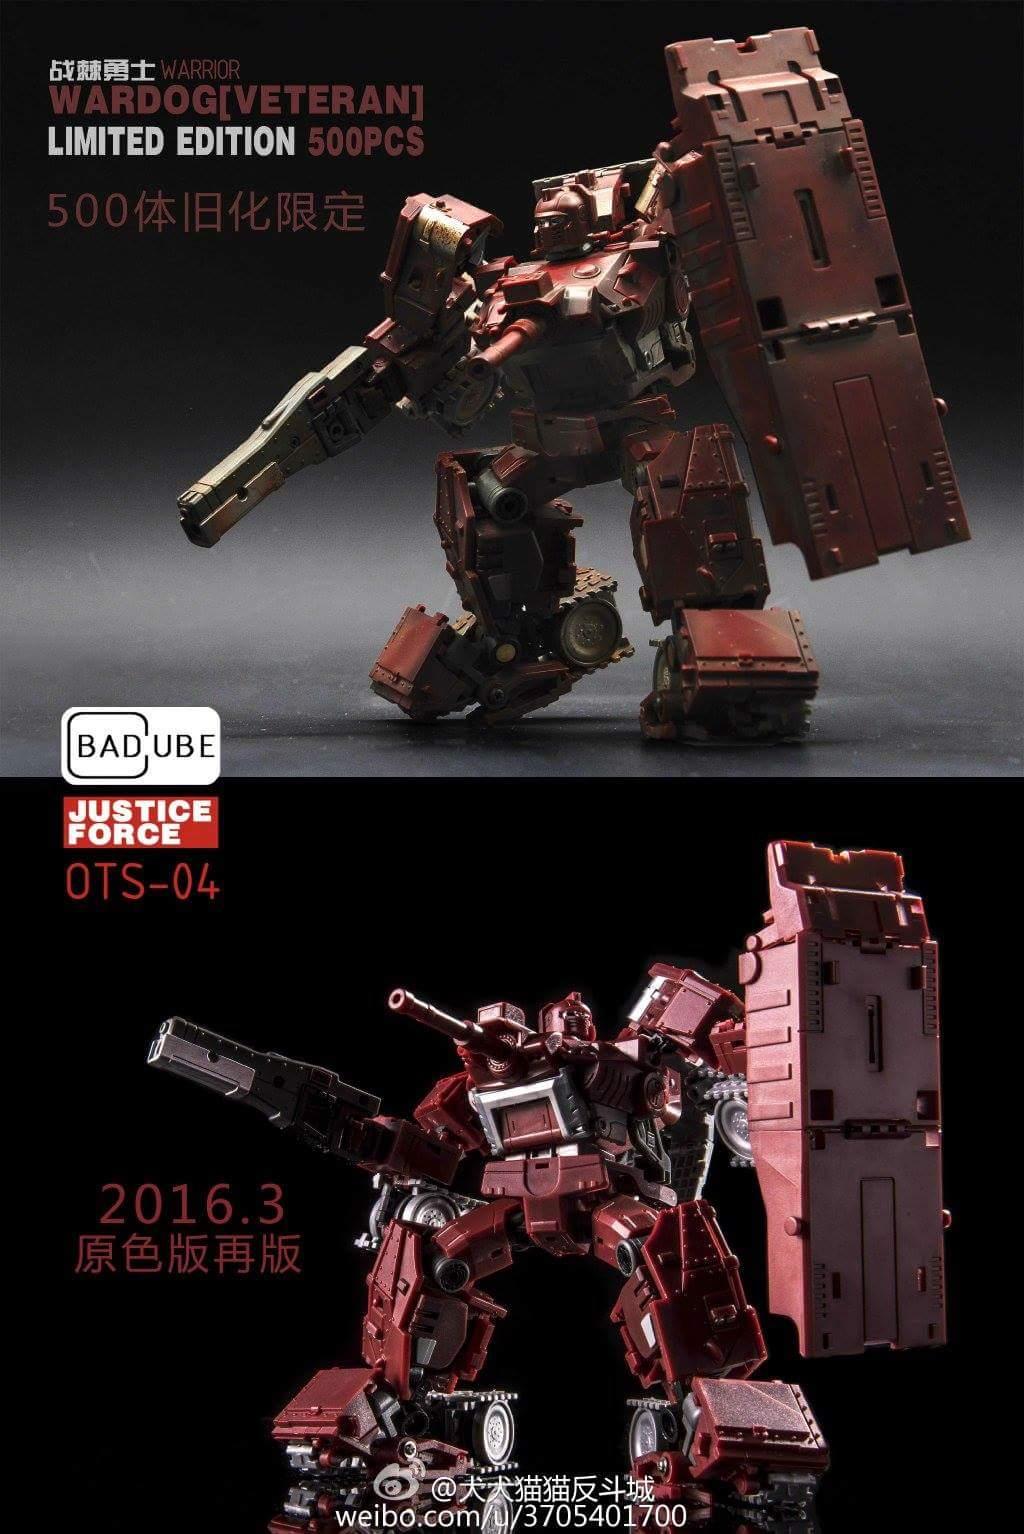 [BadCube] Produit Tiers - Minibots MP - Gamme OTS - Page 4 Hd2igXwH